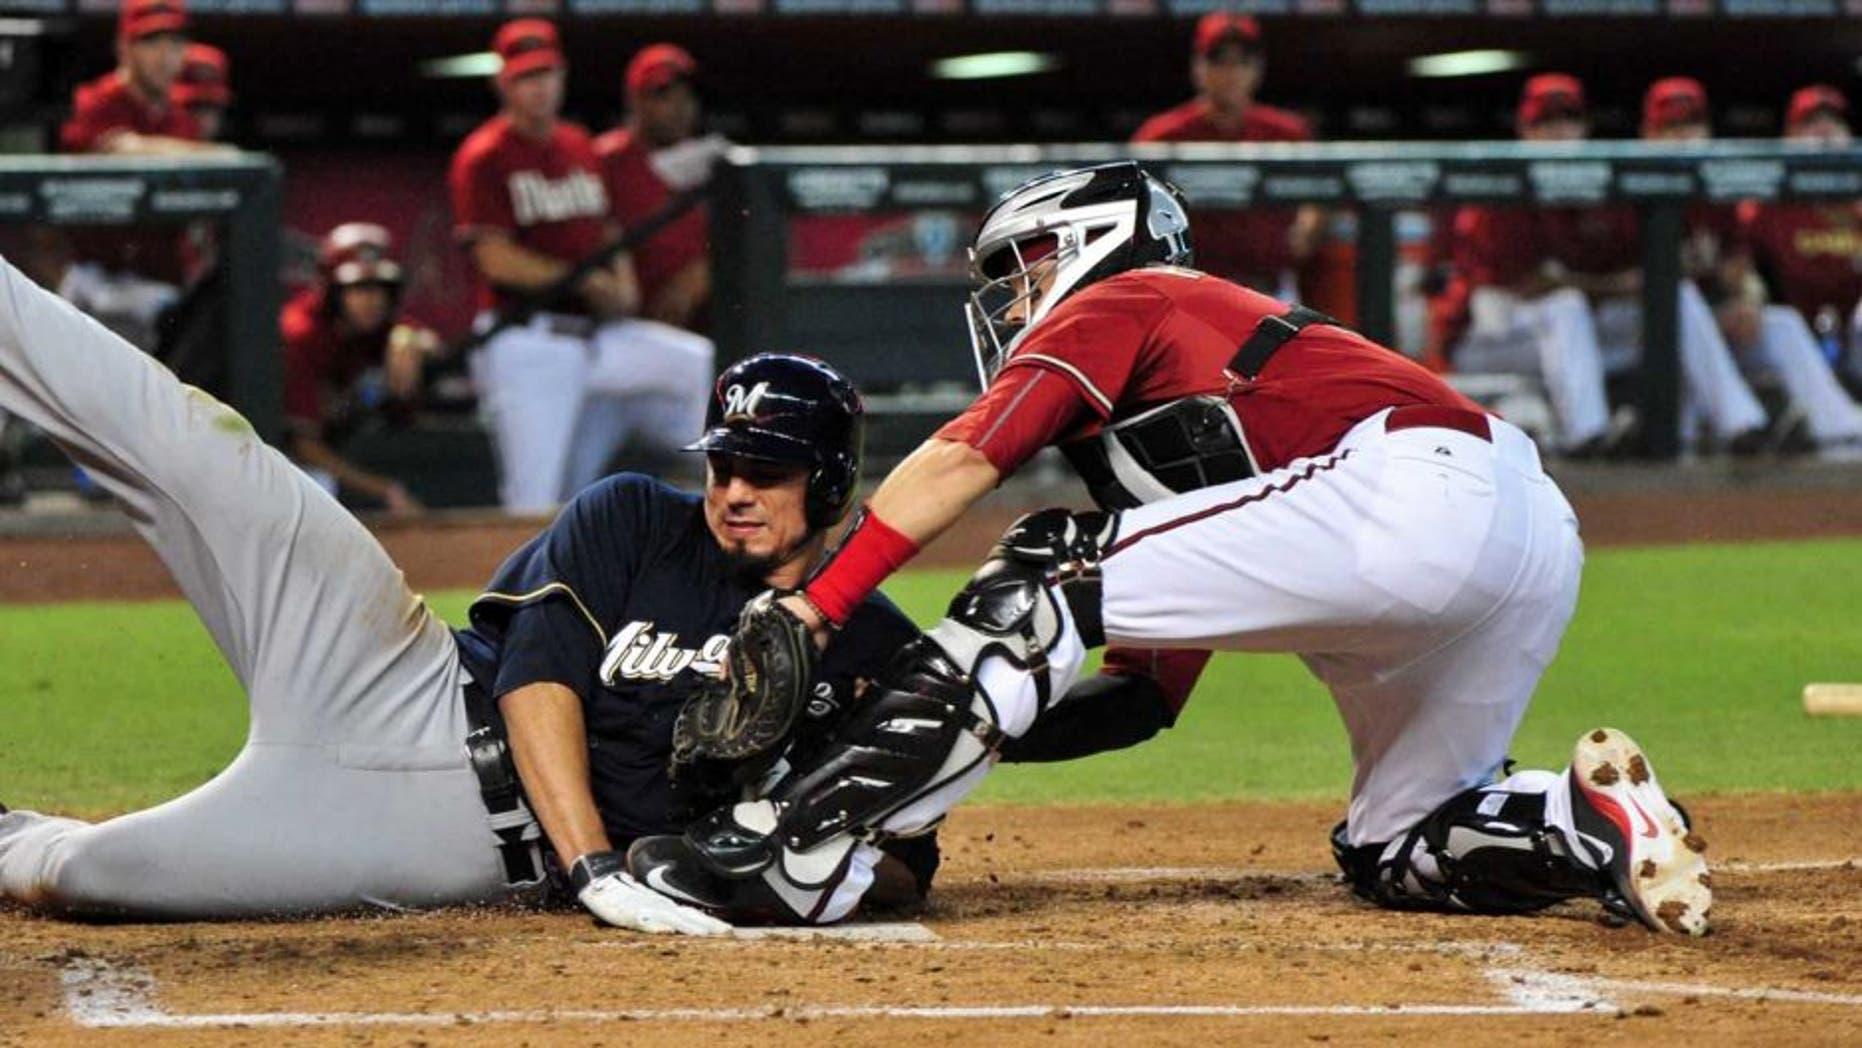 Jul 26, 2015; Phoenix, AZ, USA; Arizona Diamondbacks catcher Oscar Hernandez (right) tags out Milwaukee Brewers starting pitcher Matt Garza during the third inning at Chase Field.